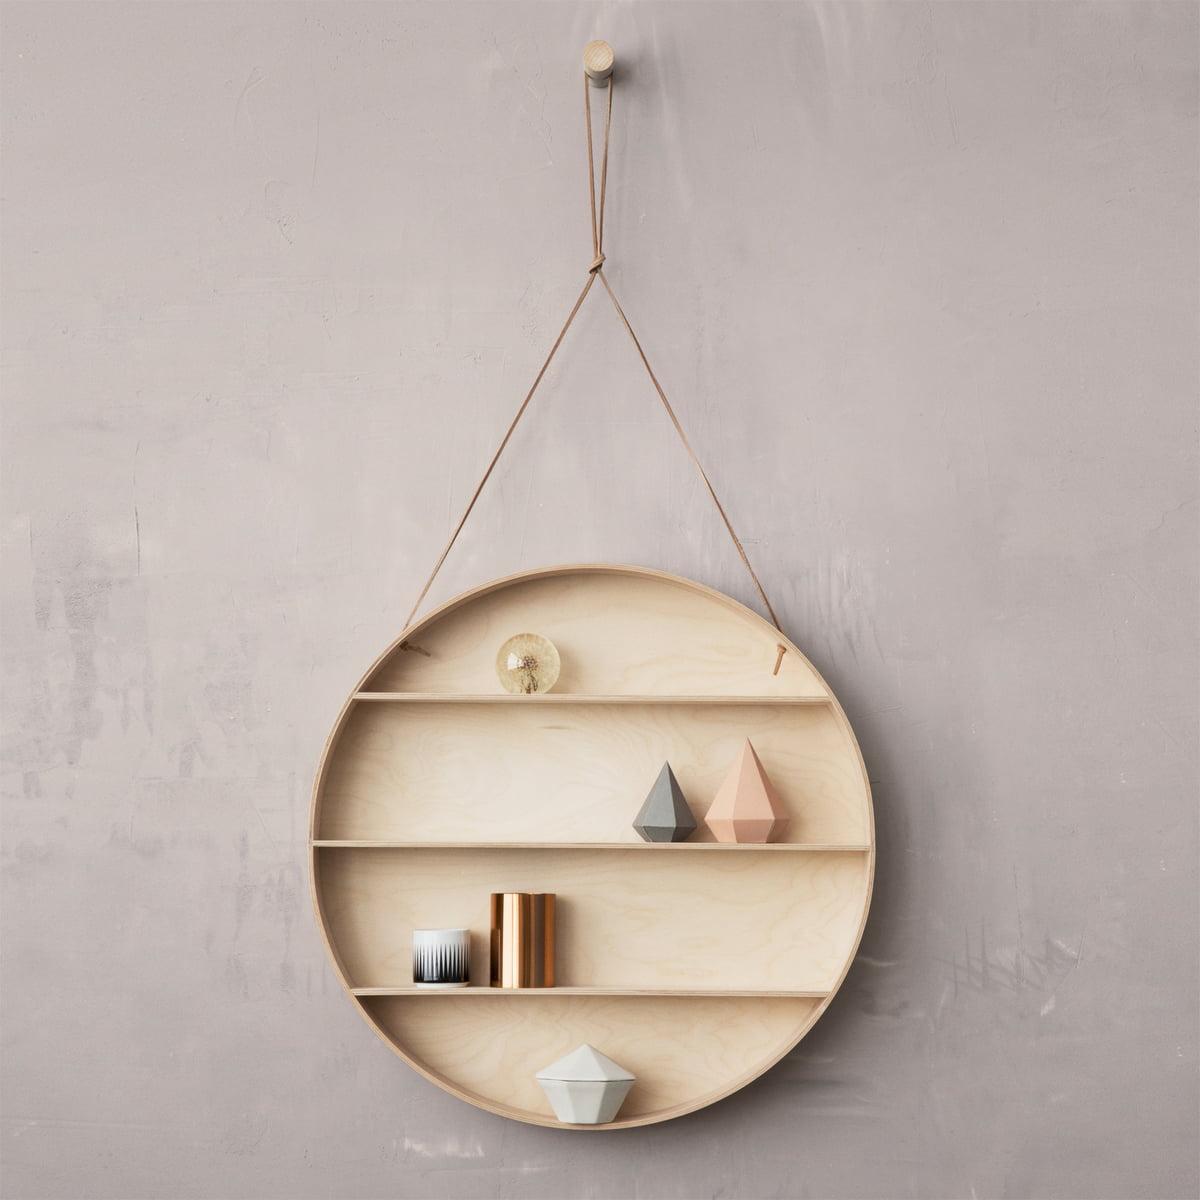 Perfect Ferm Living   The Round Dorm, Hanging Shelf